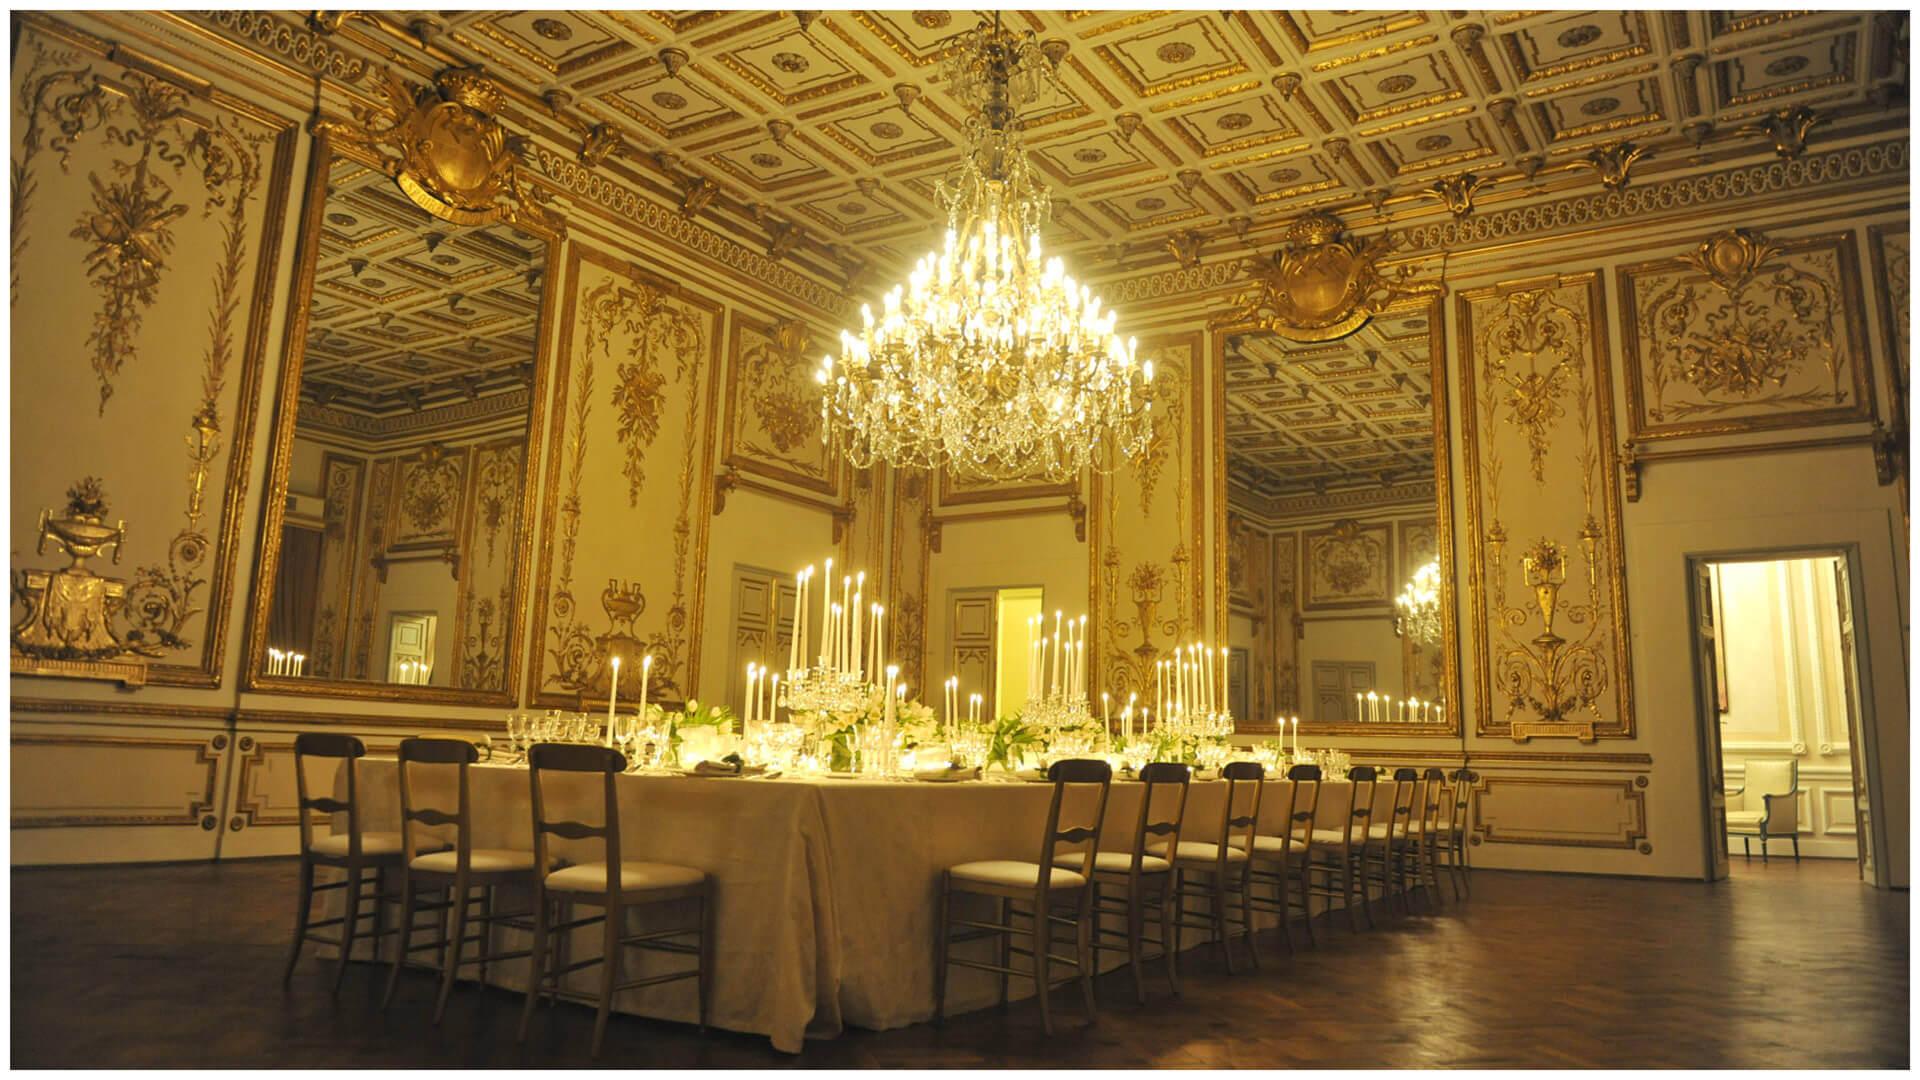 palazzo_gianfigliazzi_fiorile_firenze_4